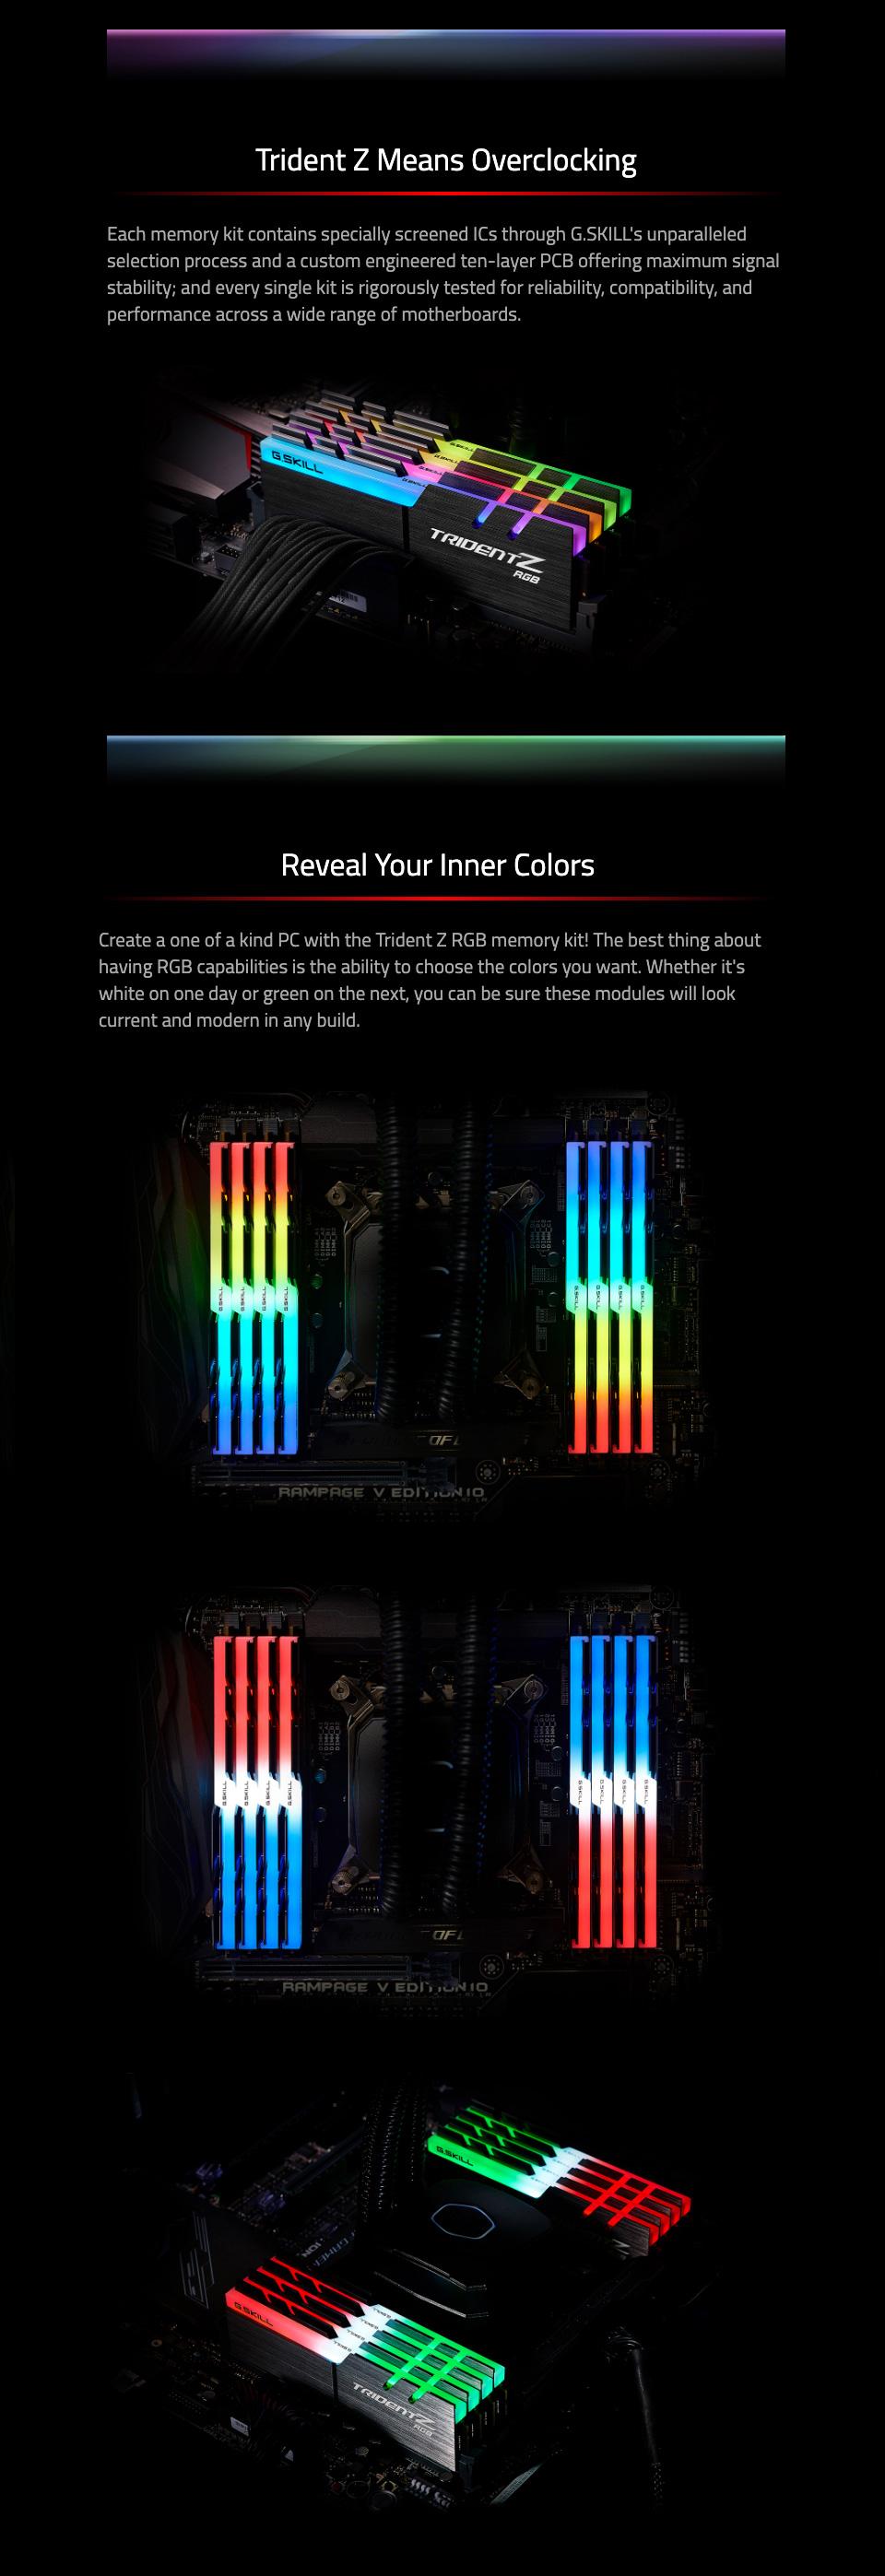 G.Skill Trident Z RGB F4-3600C16D-32GTZRC 32GB (2x16GB) DDR4 features 2